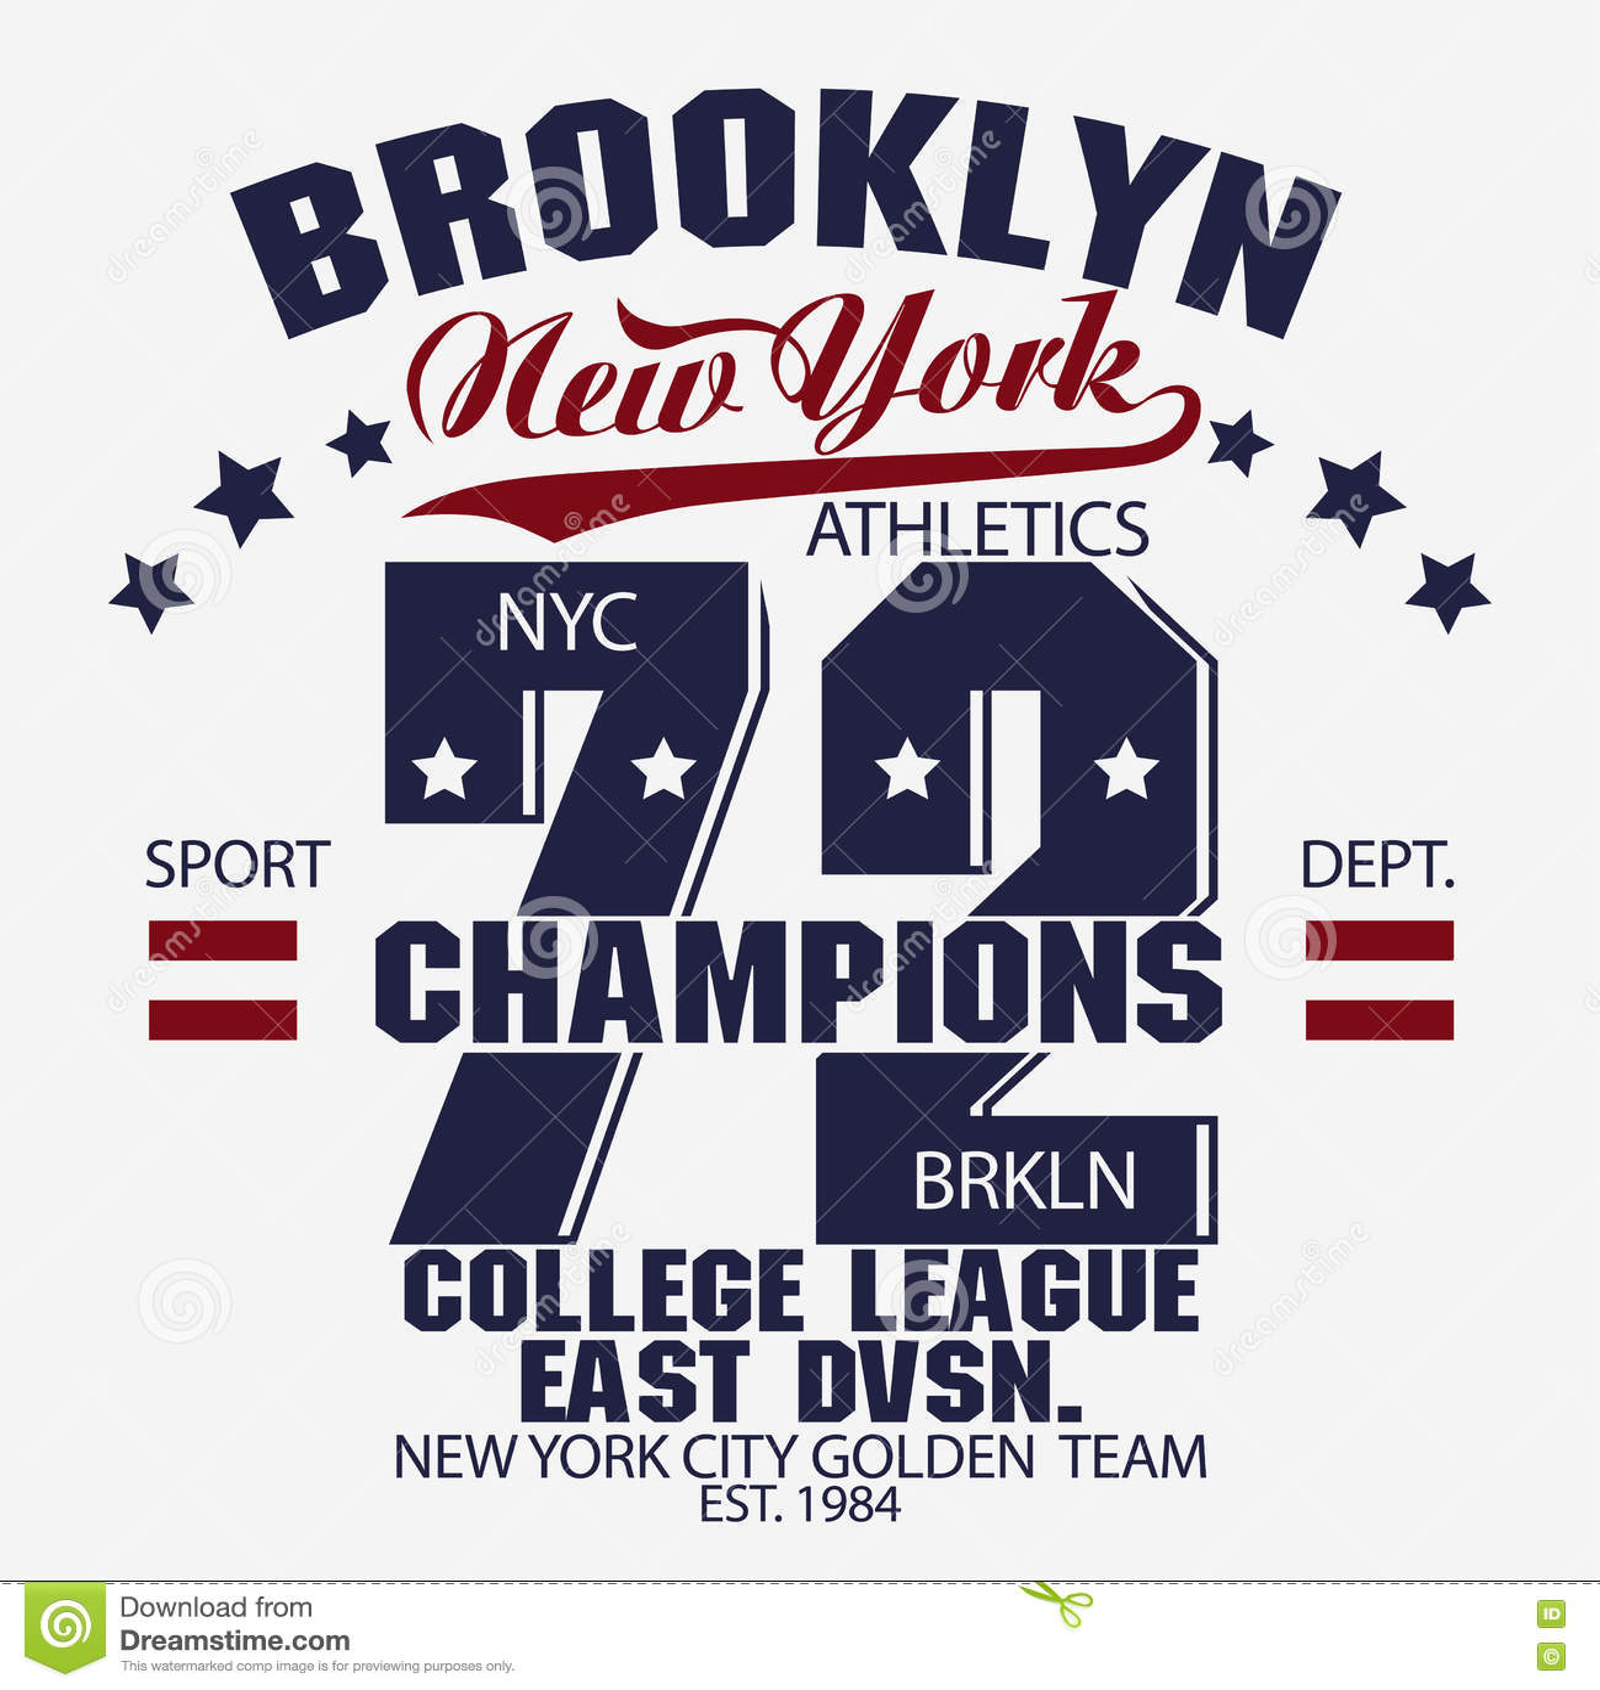 Brooklyn t-shirt graphics stock vector. Illustration of badge - 79073351 bb506726a